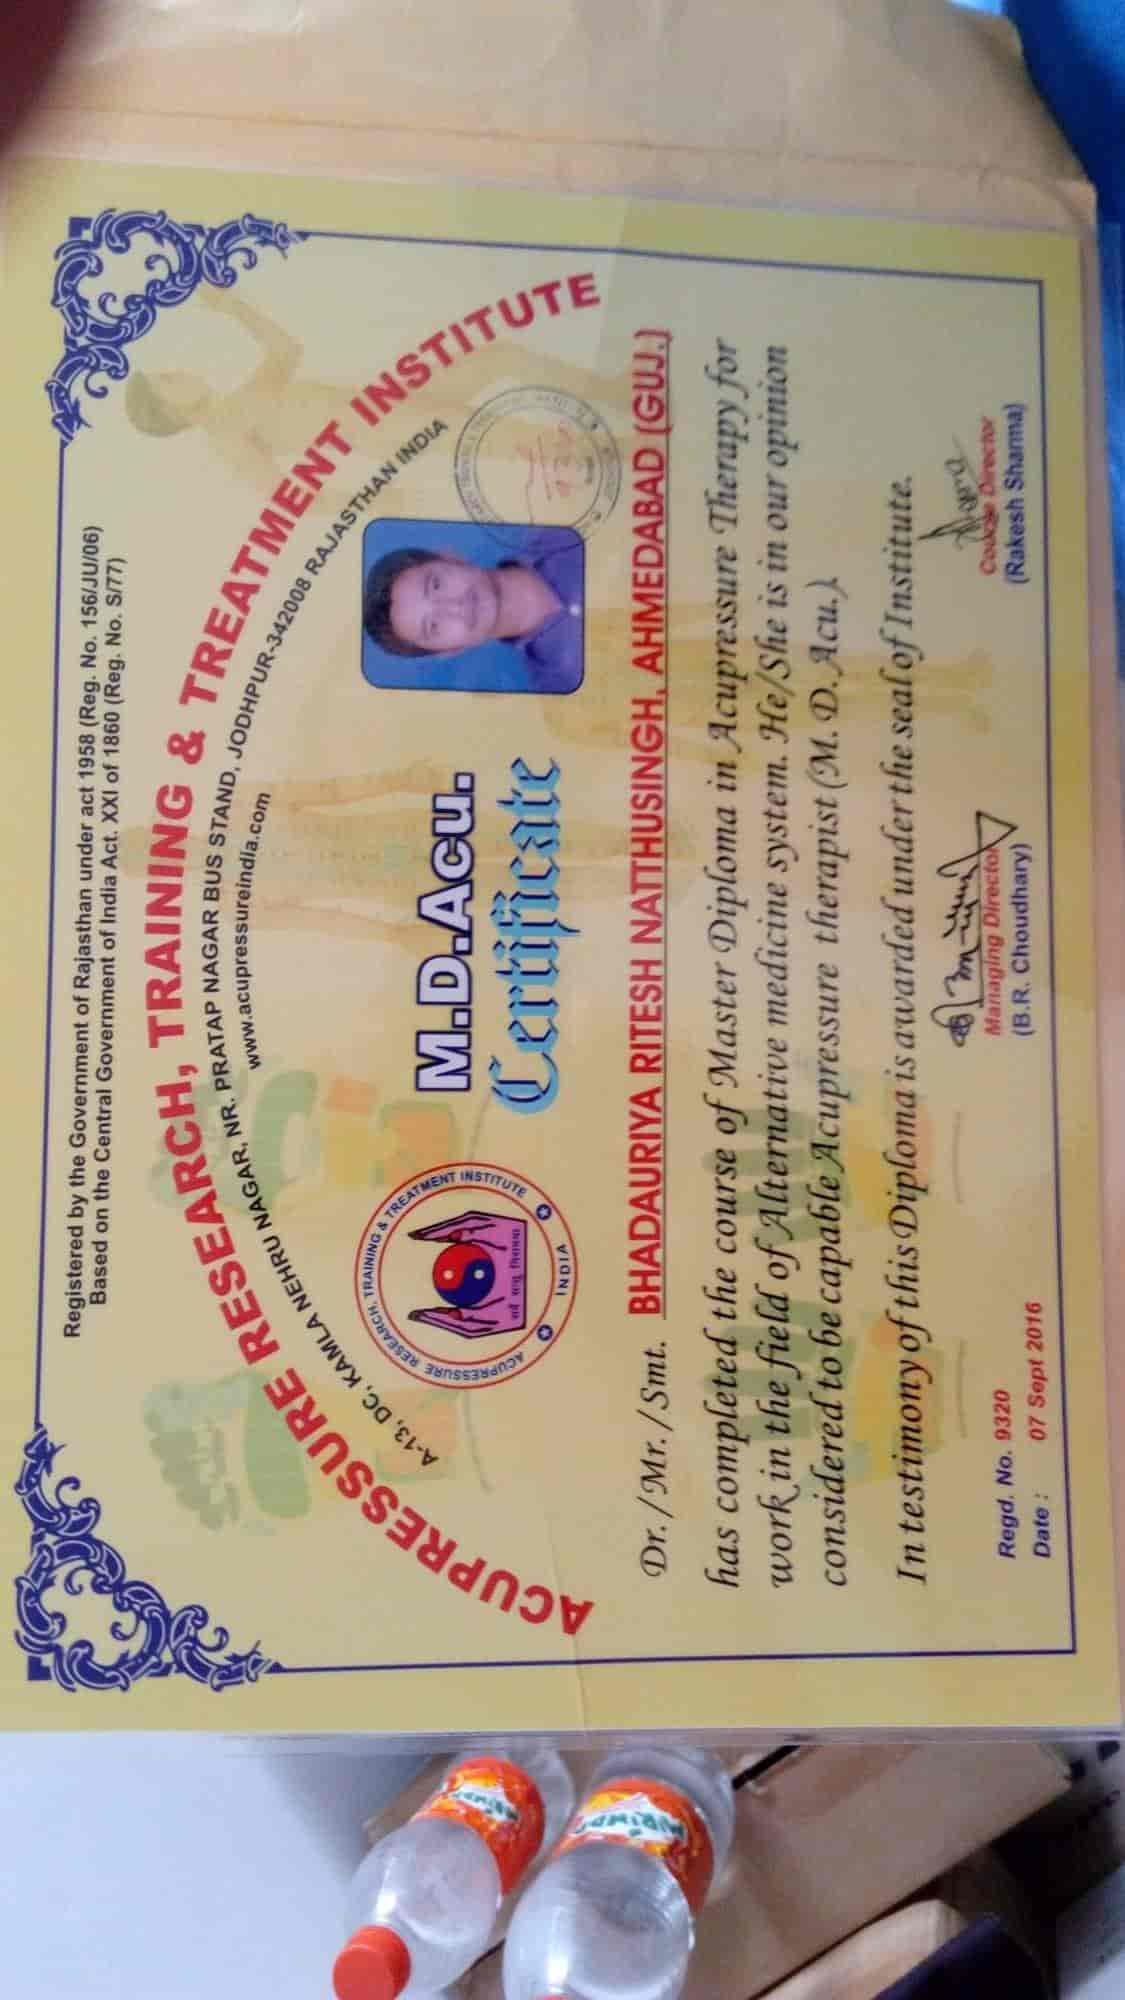 Shivkrupa Acupressure Treatment And Training Centre, Kudasan